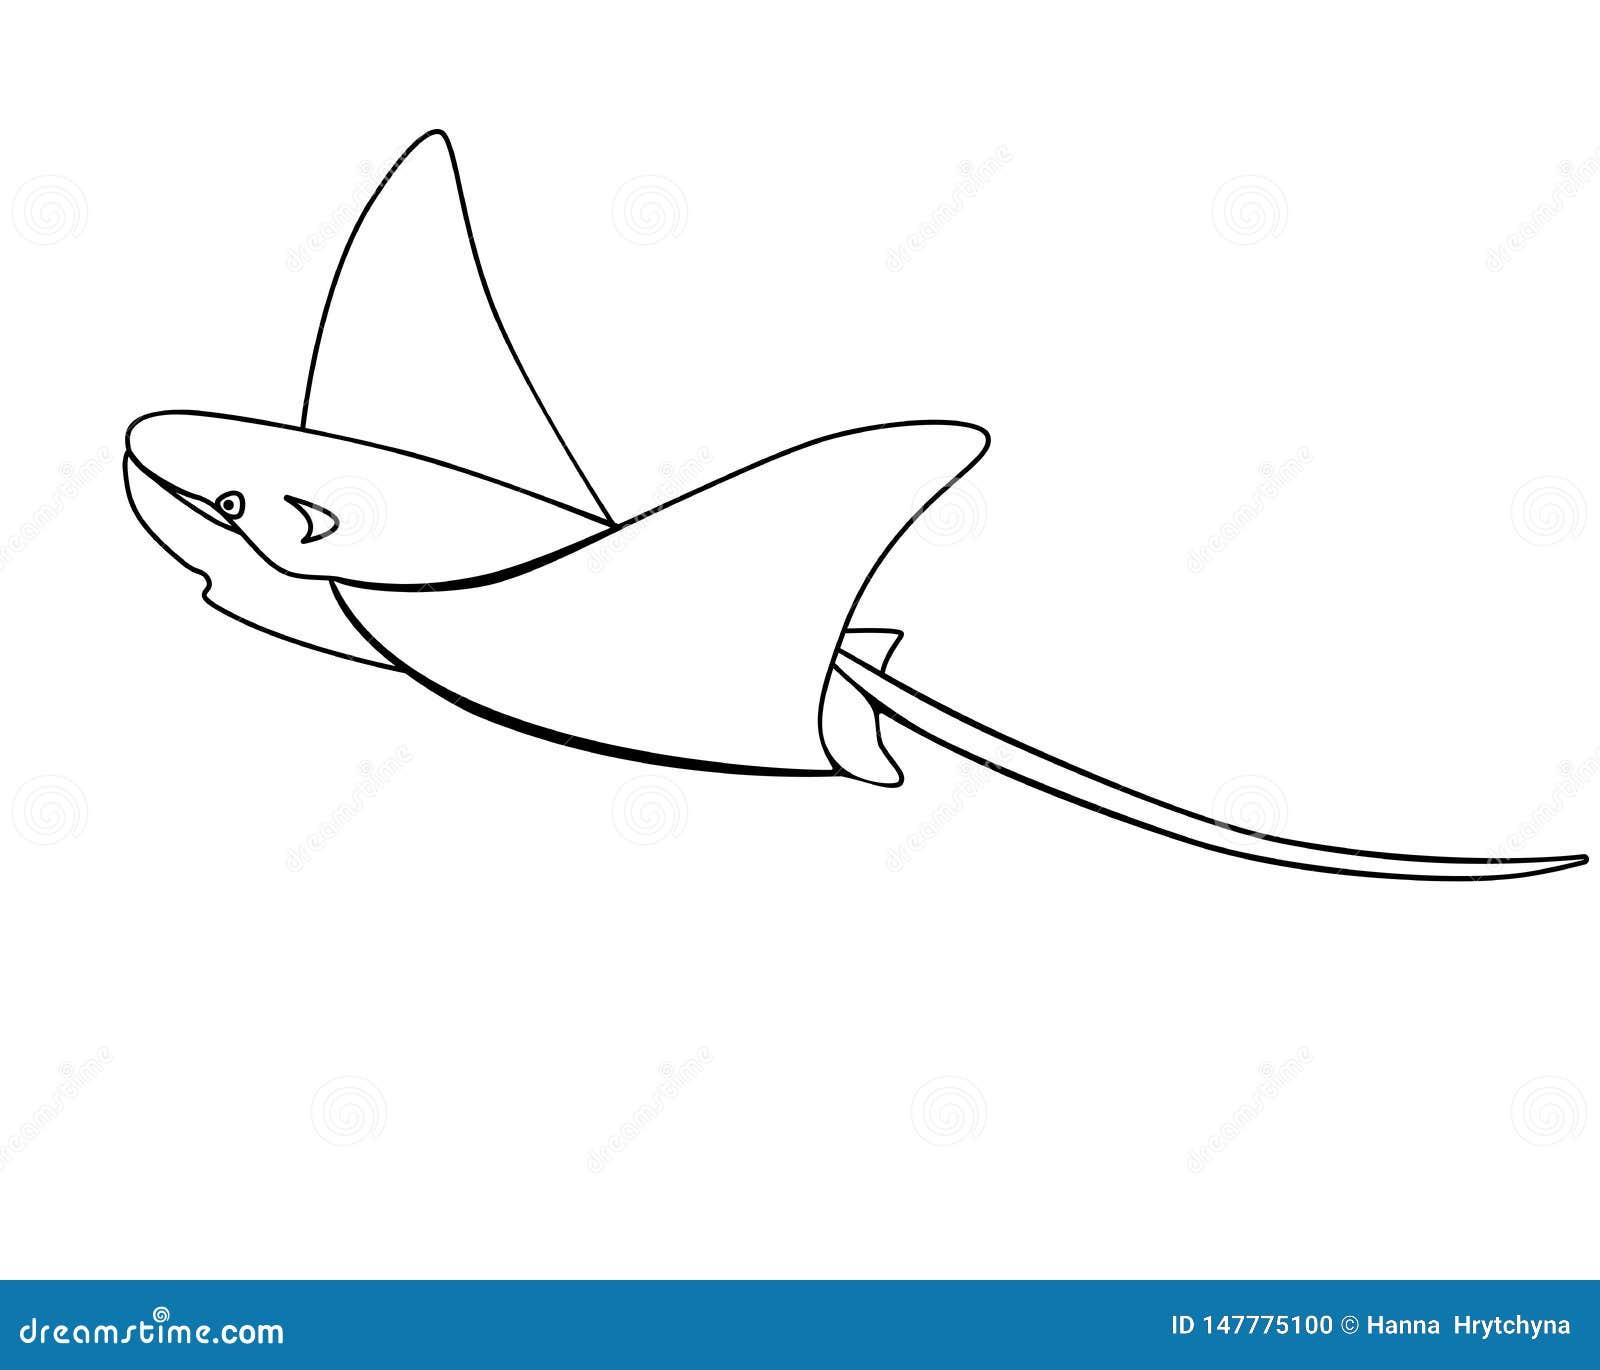 Electric Ramp, Ramp, Manta - fish, sea animal. Outline. Skat. Cramp-fish